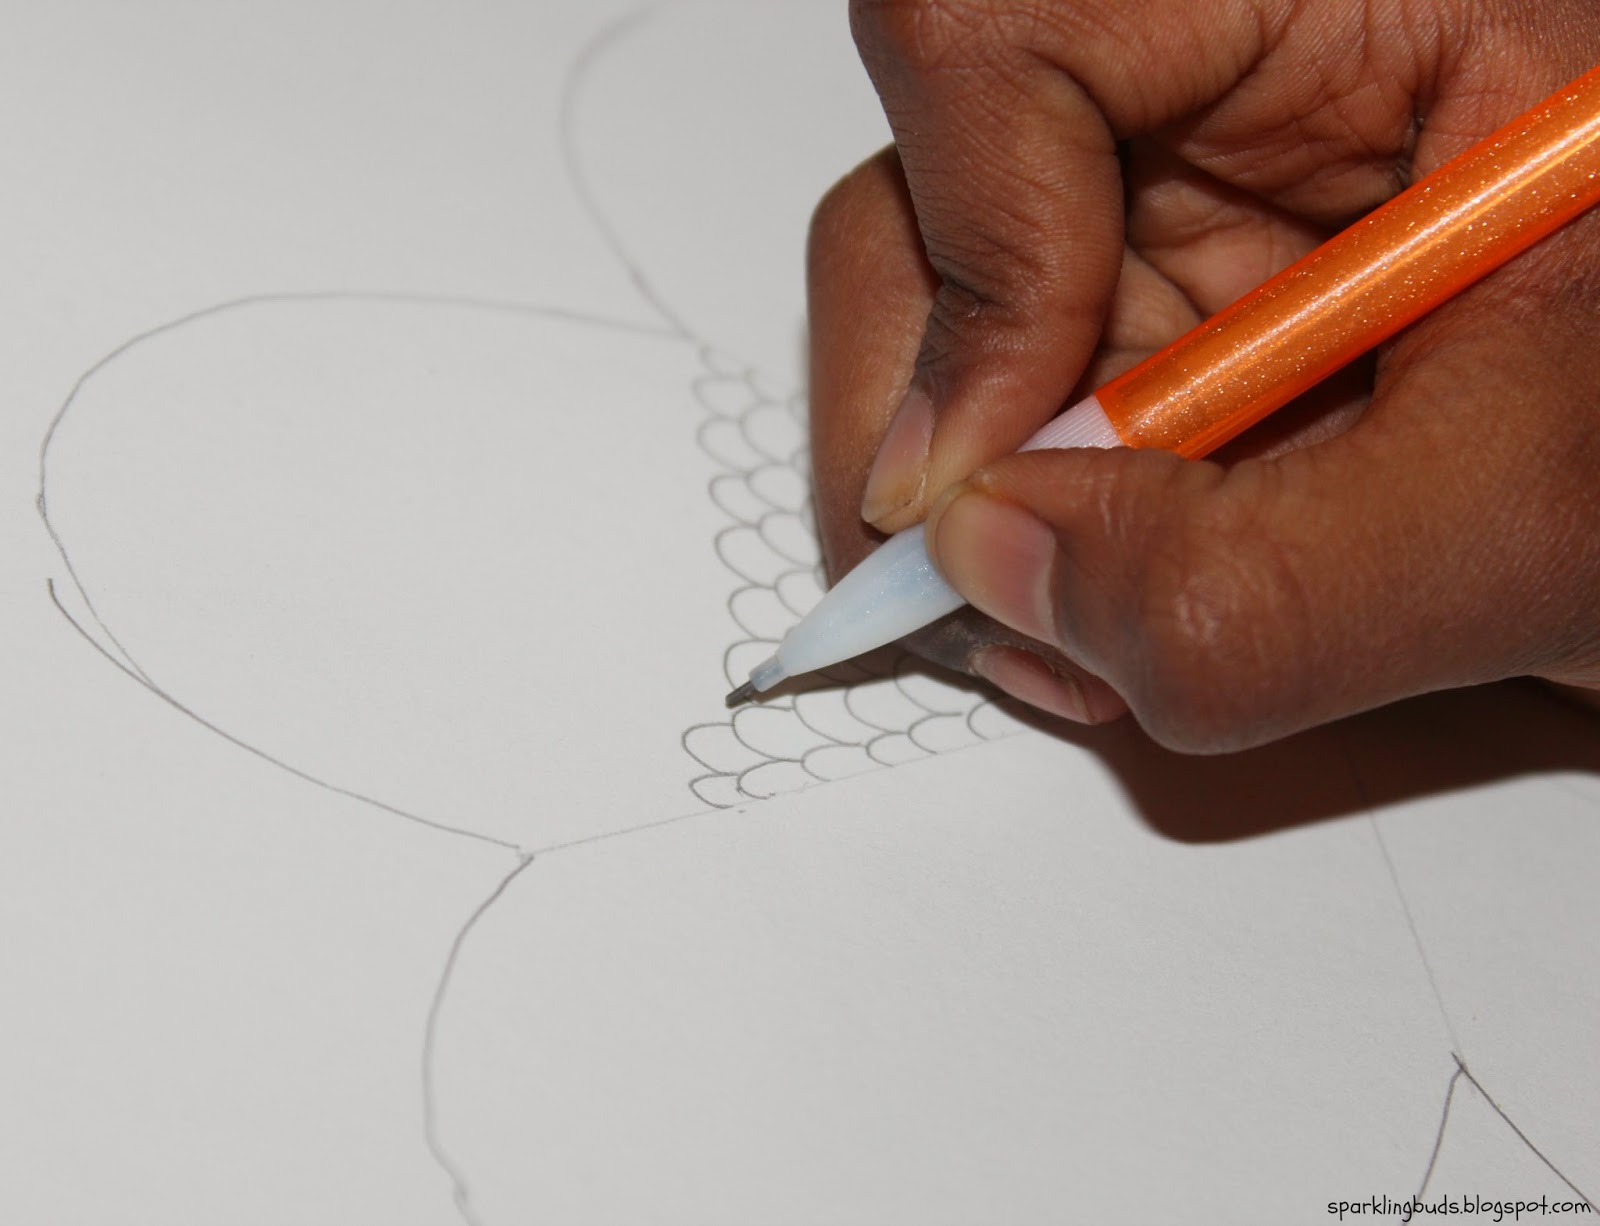 Doodling ideas for kids